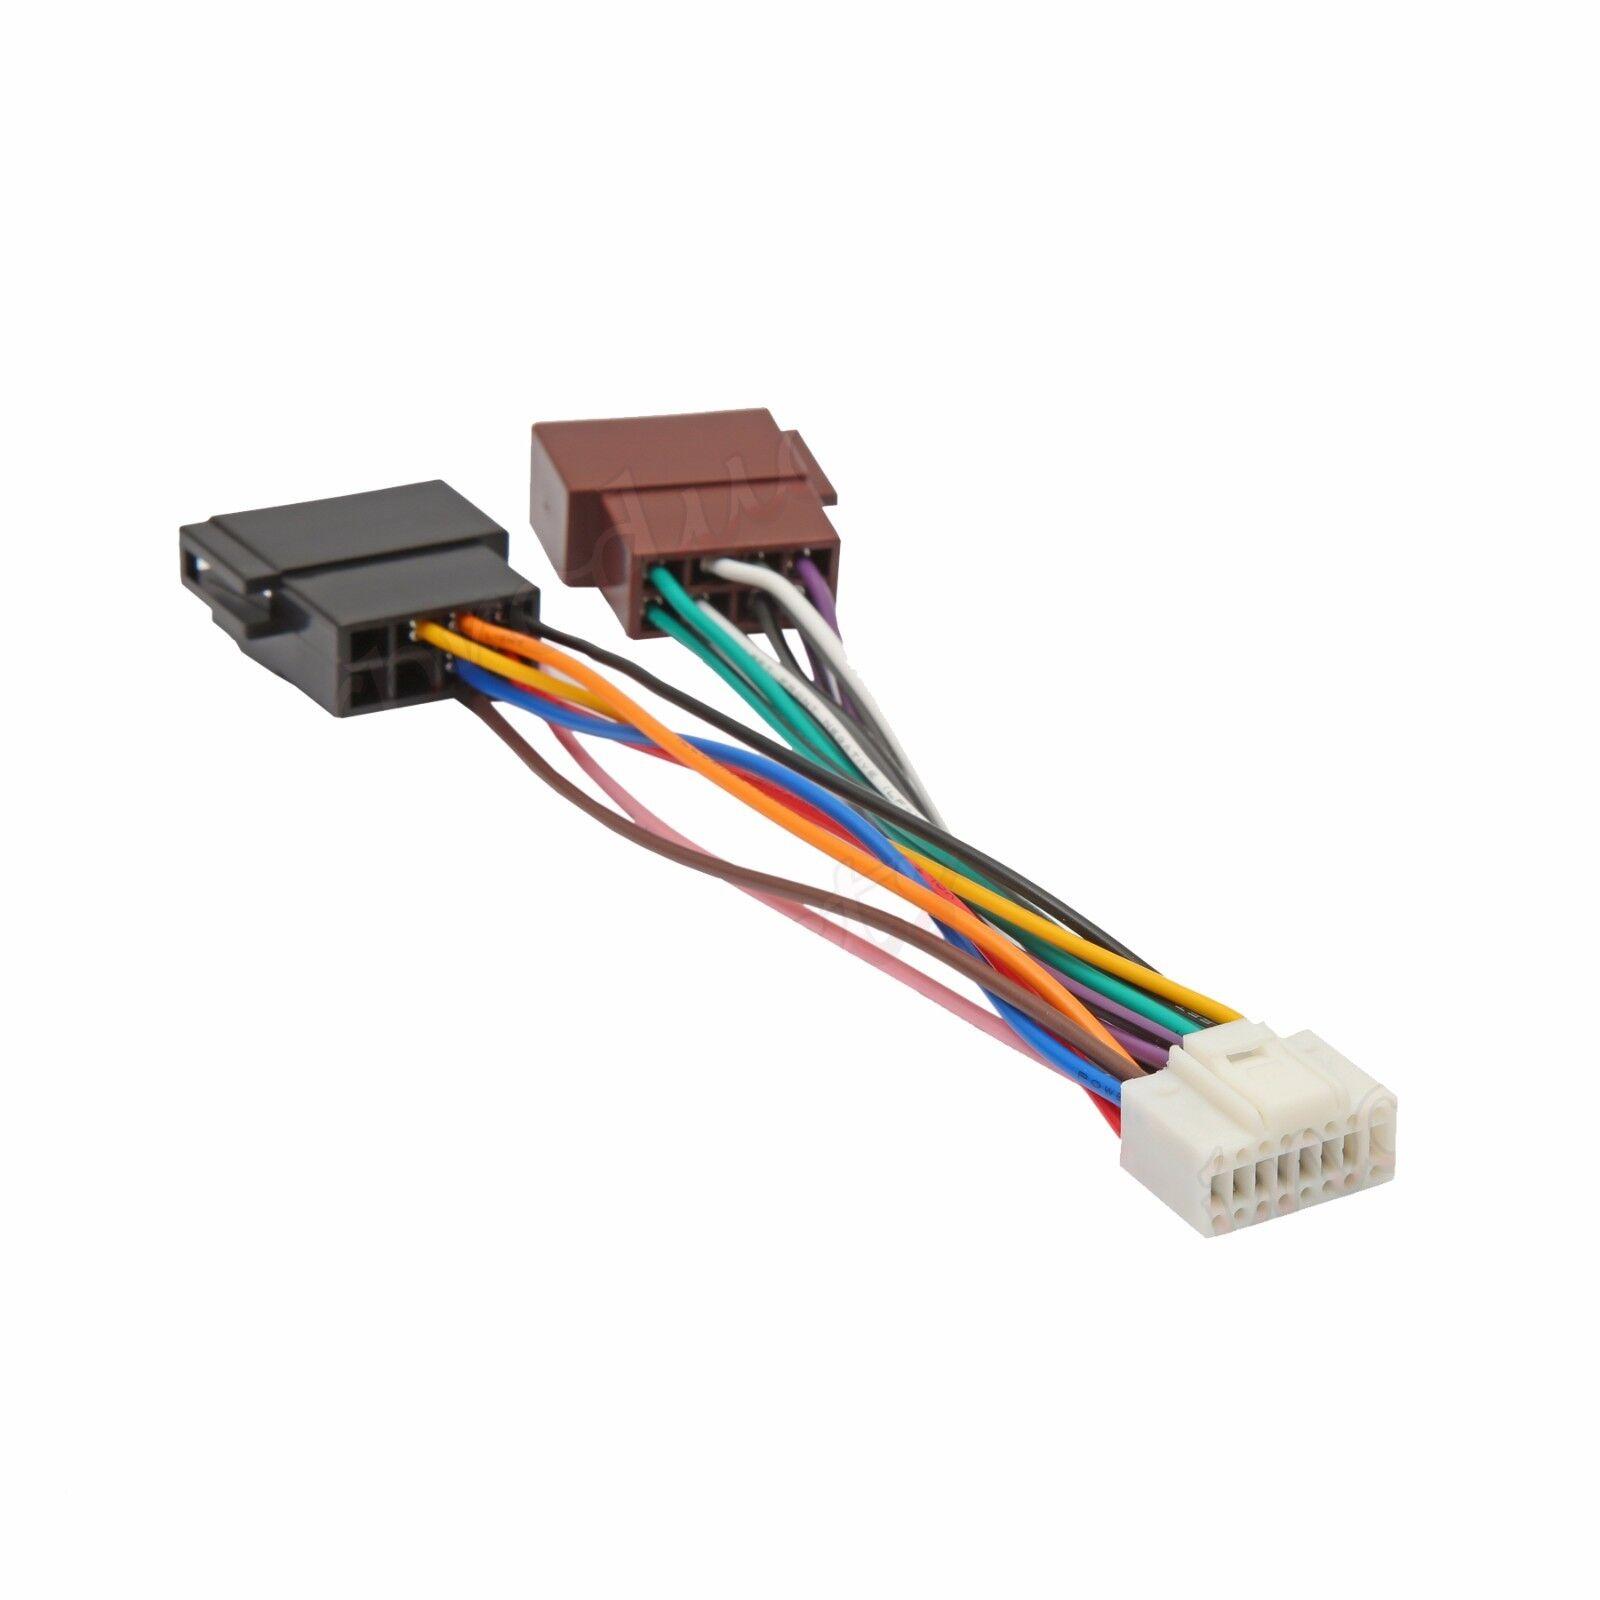 alpine 16 pin iso wiring harness connector adaptor car stereo radio loom [ 1600 x 1600 Pixel ]